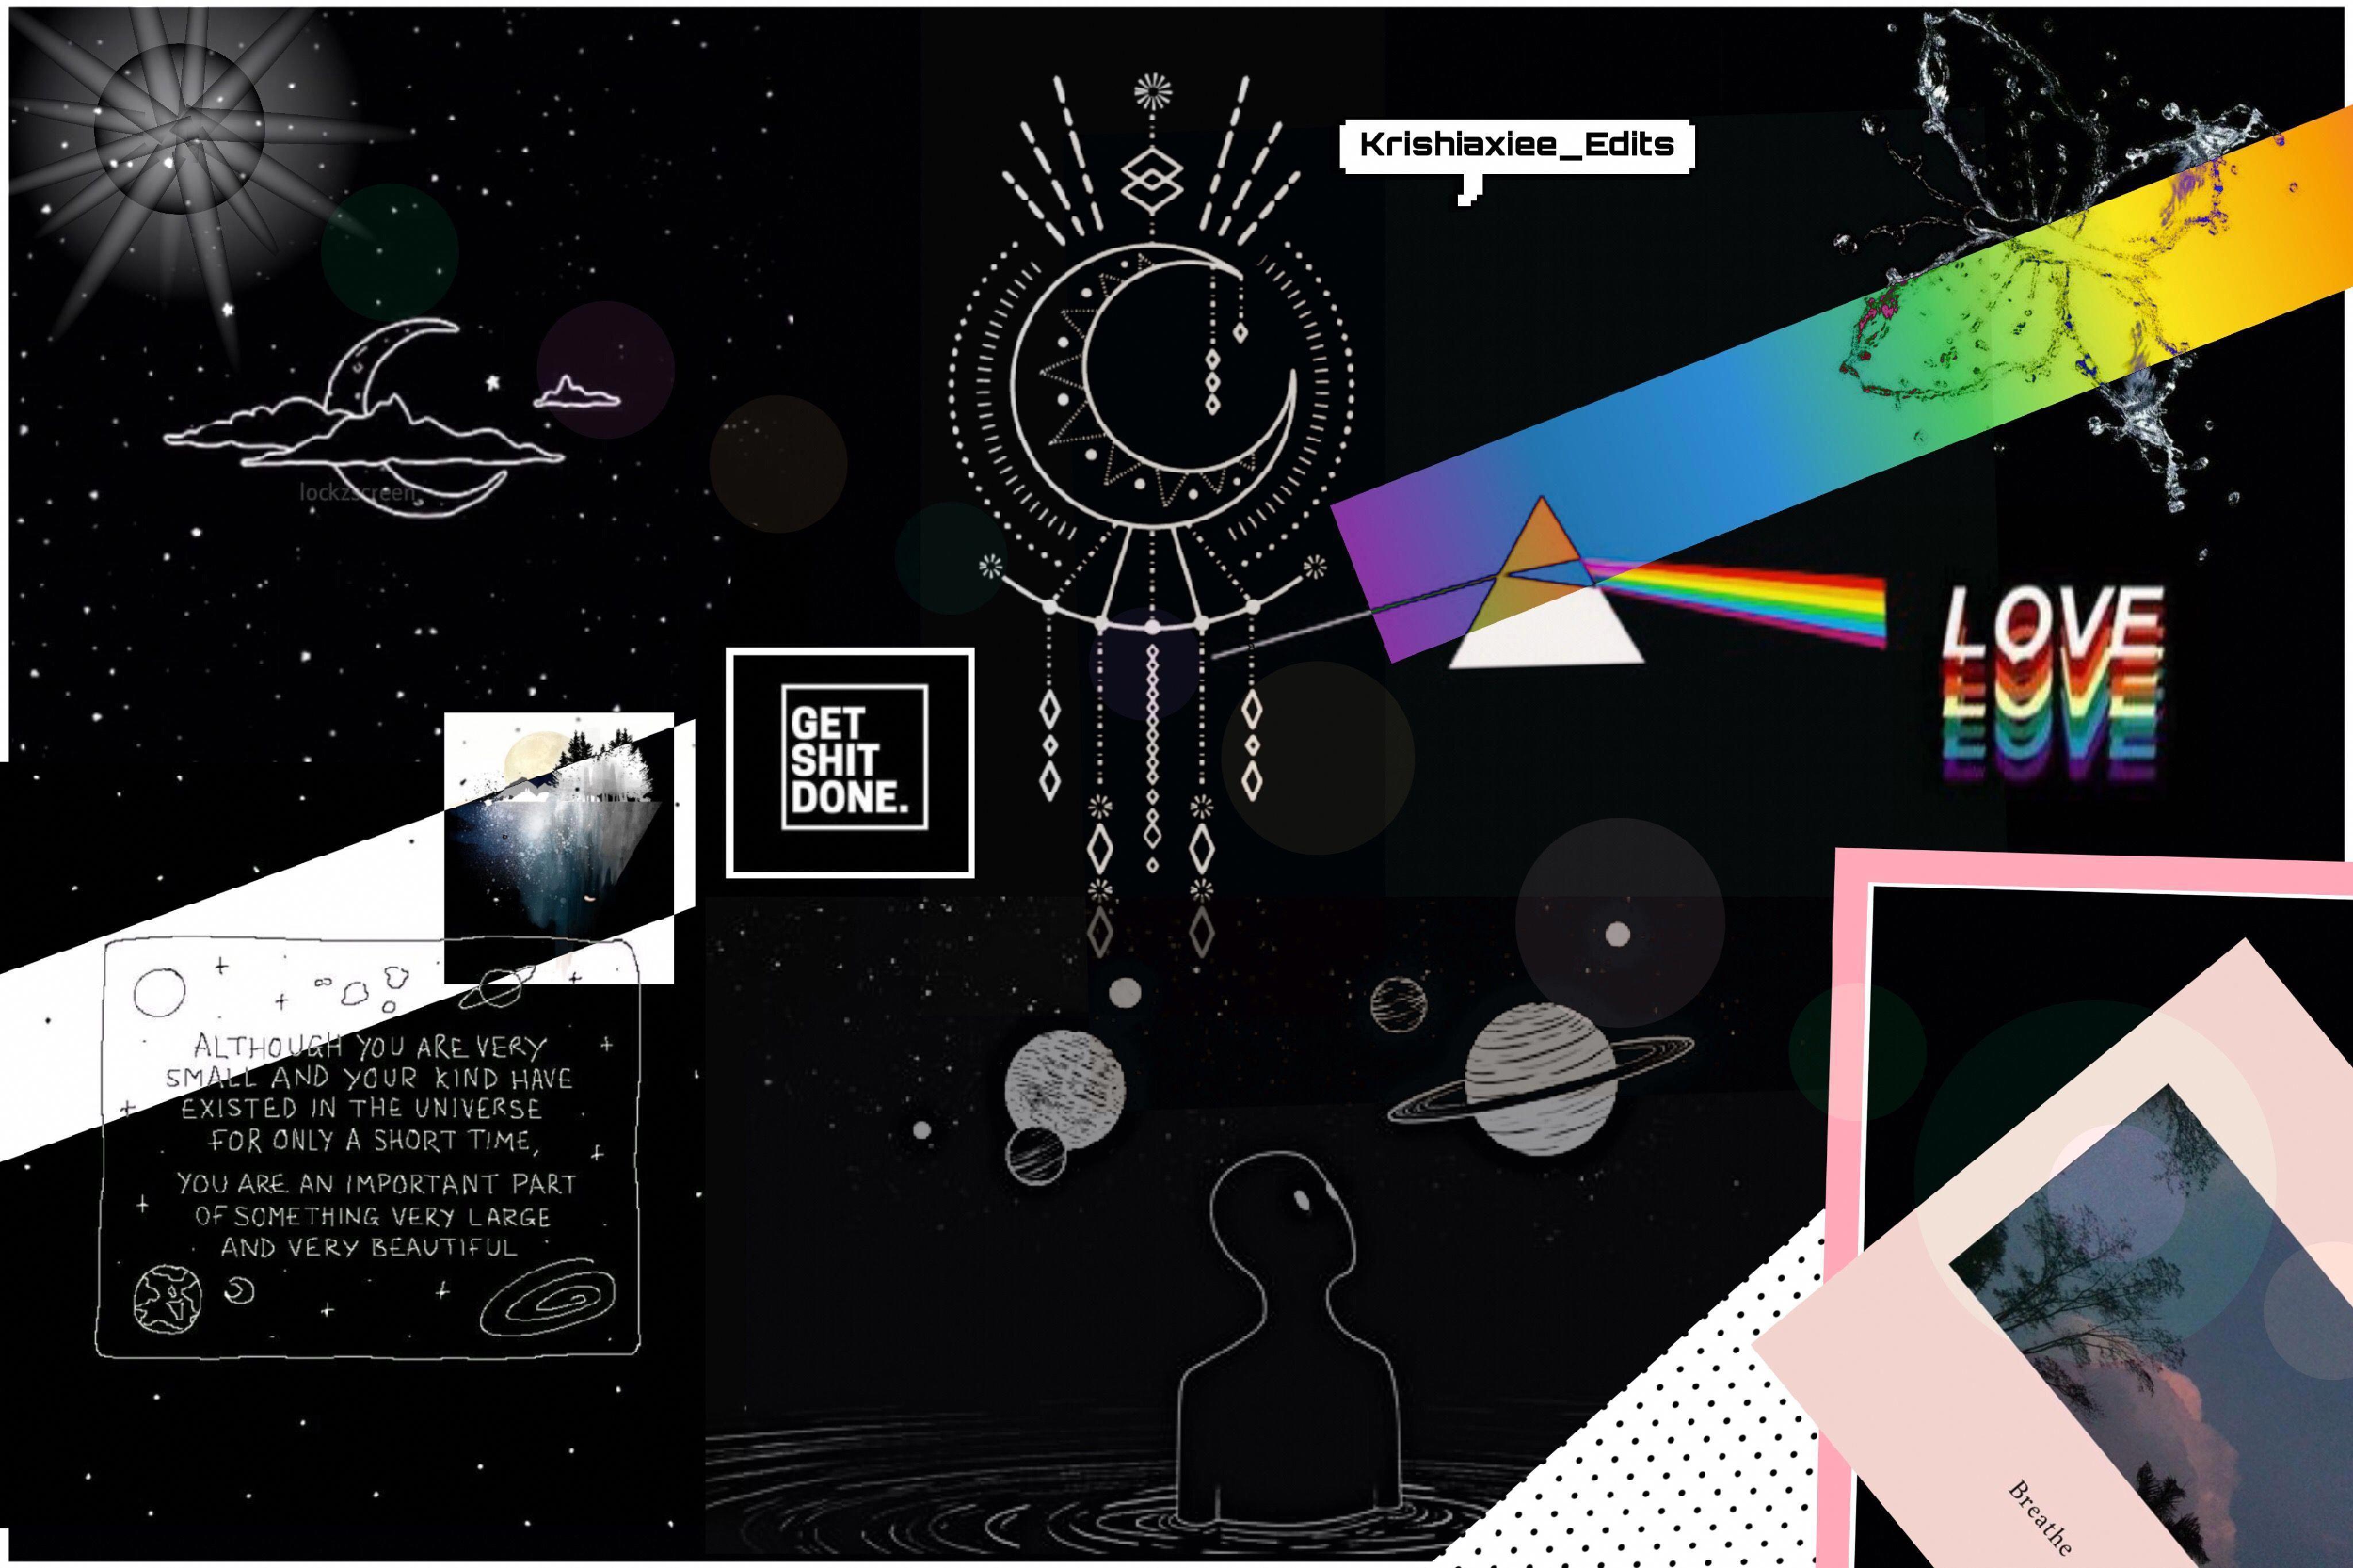 Black Aesthetic Laptop Background Wallpaper Krishiaxiee Edits Laptop Wallpaper Laptop Wallpaper Desktop Wallpapers Computer Wallpaper Desktop Wallpapers